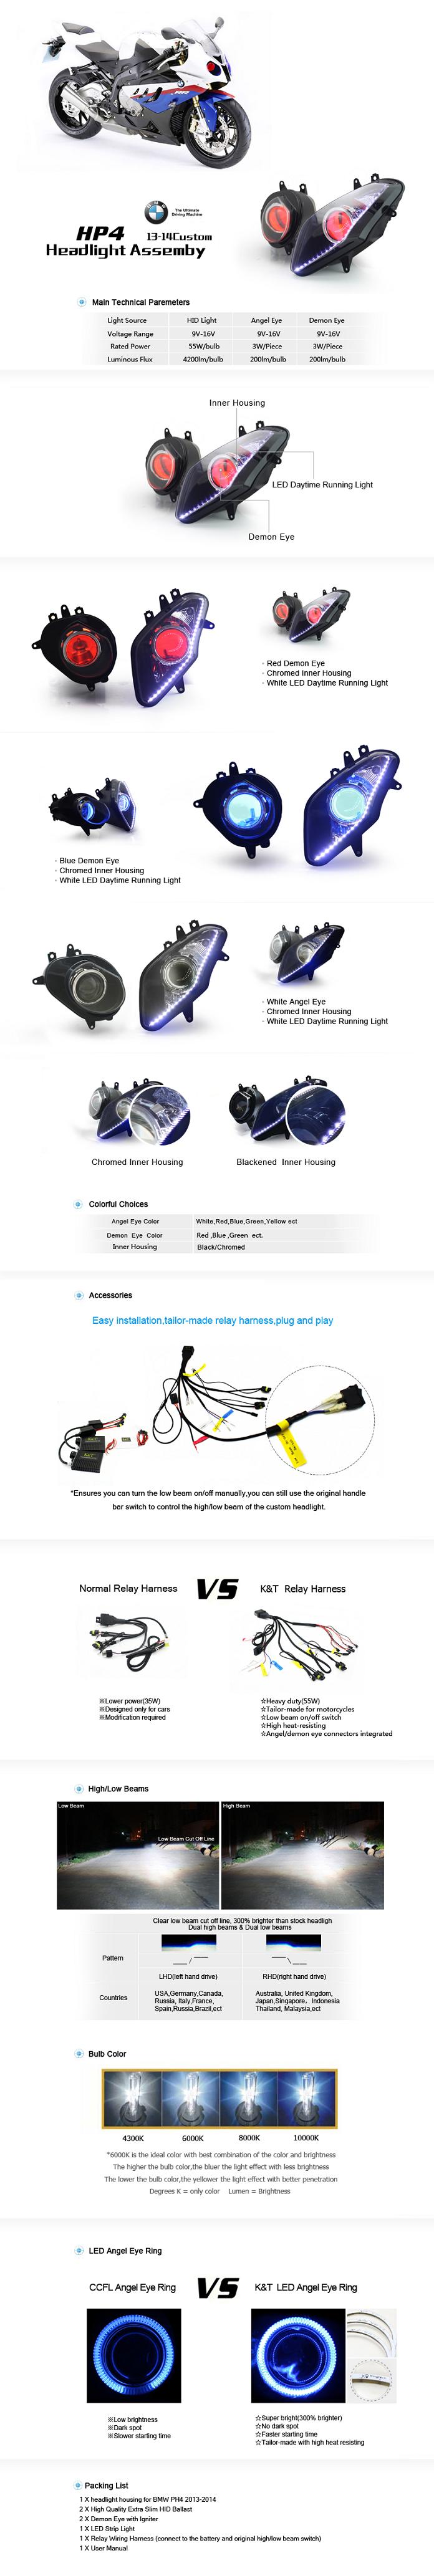 13 15 Bmw S1000r Hp4 Projector Hid Eye Headlight Xtreme Discount Cycle Custom Headlights Bmw S1000rr Honda Cbr600rr